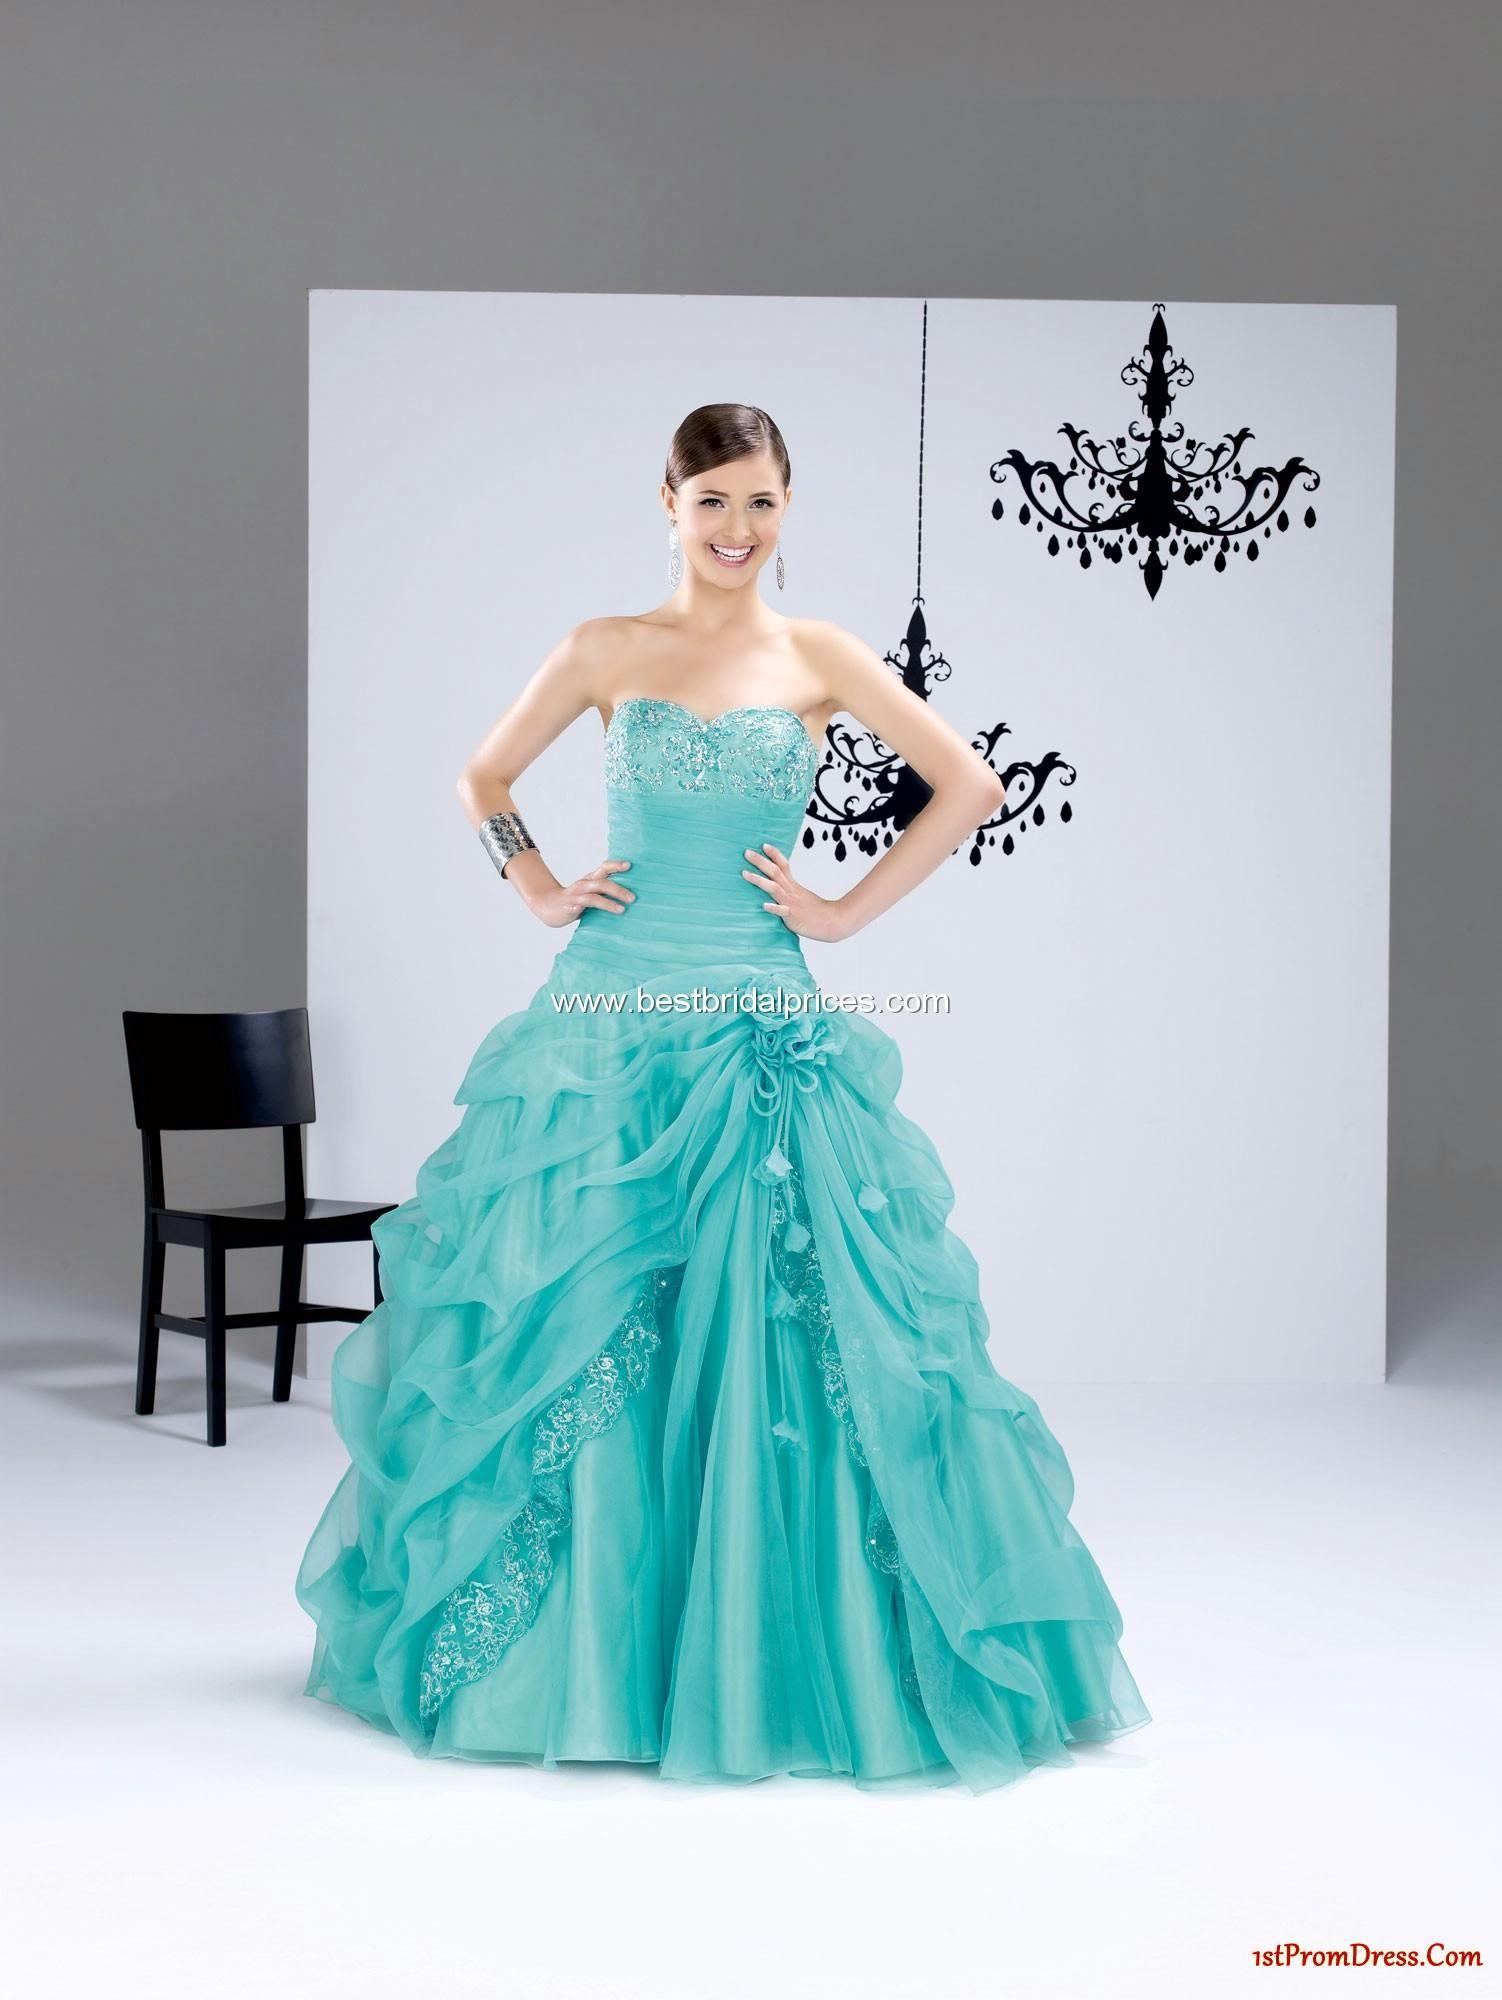 masquerade dresses | Quinceanera Dresses Masquerade Ball Gowns ...